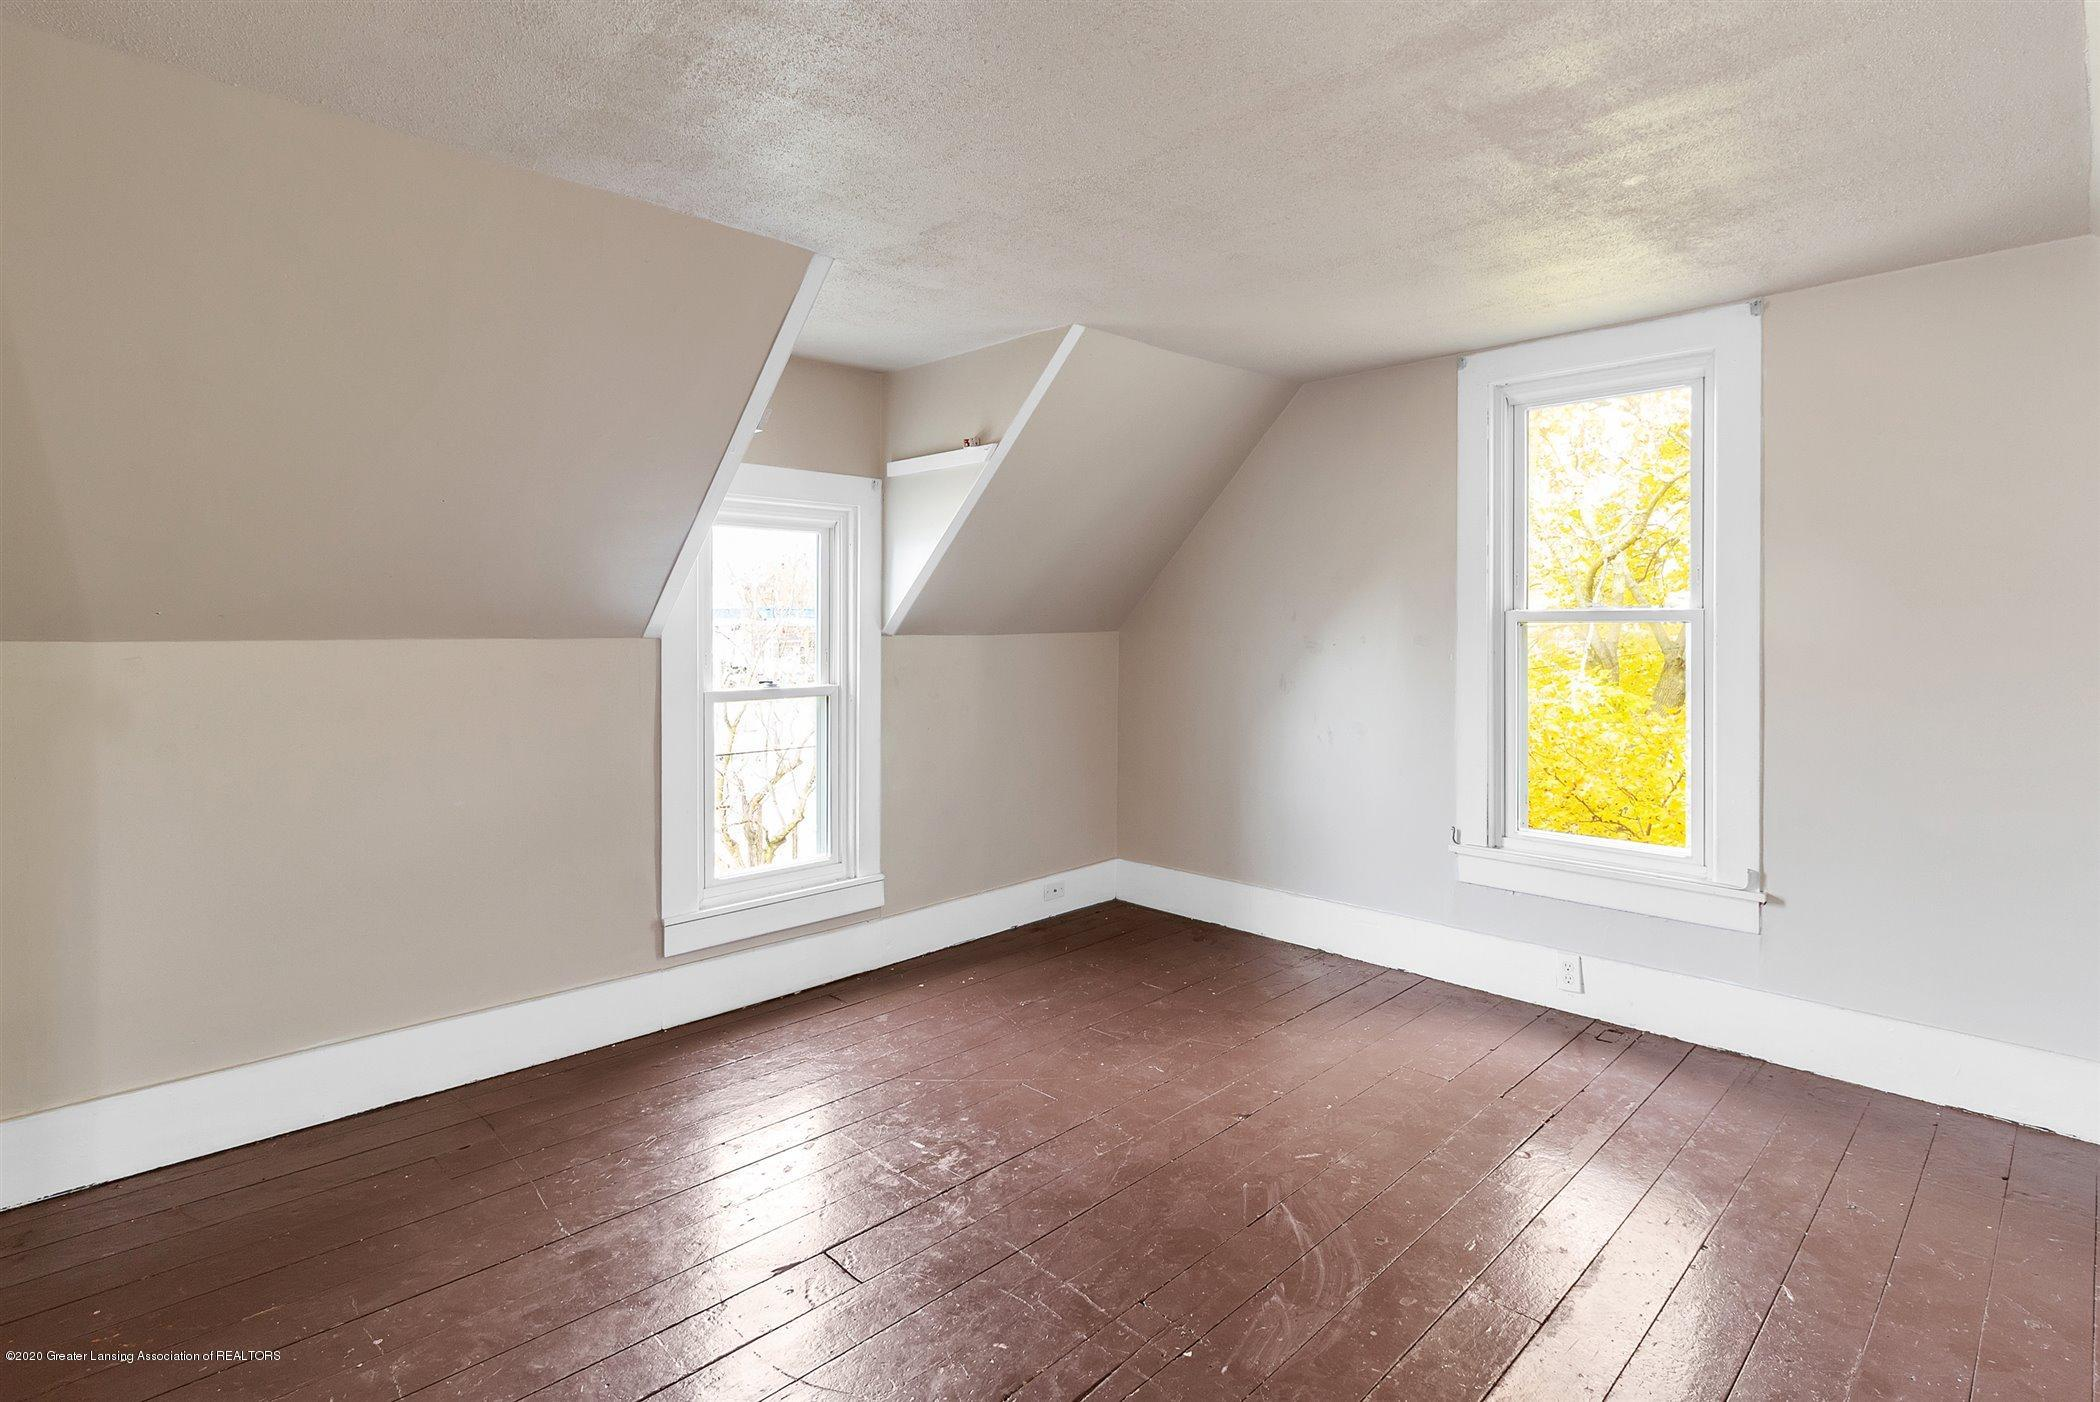 114 E Knight St - Upstairs Bedroom #2 - 24